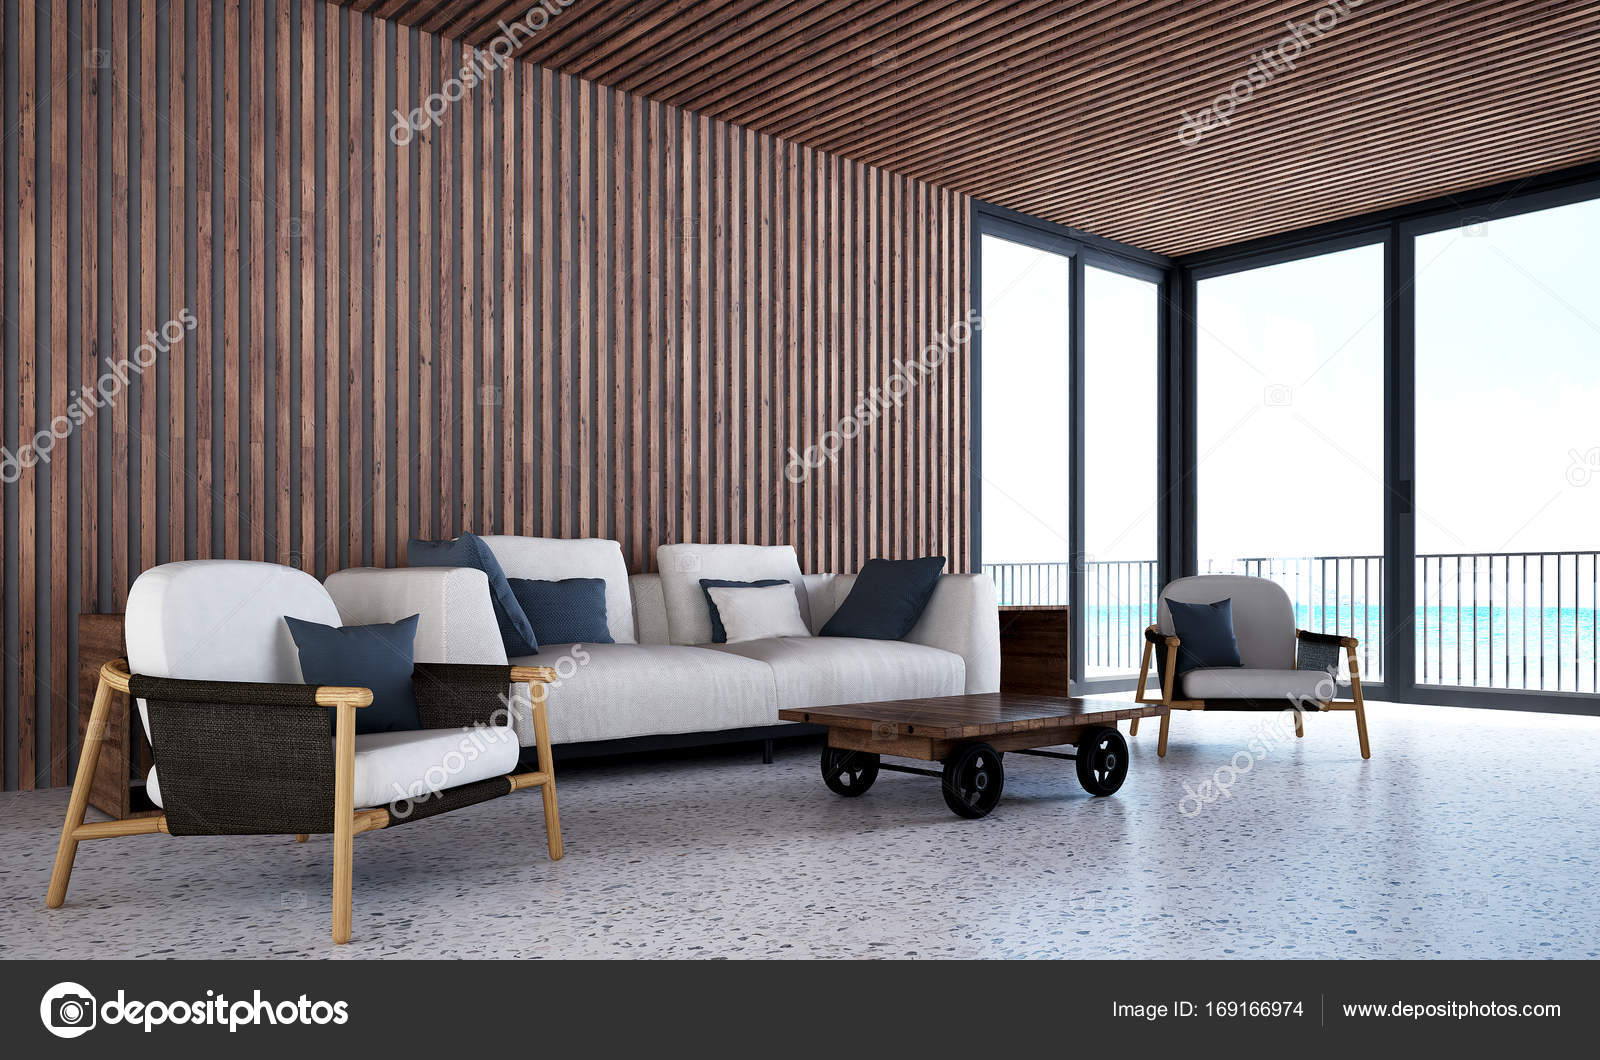 https://st3.depositphotos.com/11732771/16916/i/1600/depositphotos_169166974-stockafbeelding-de-design-interieur-van-woonkamer.jpg